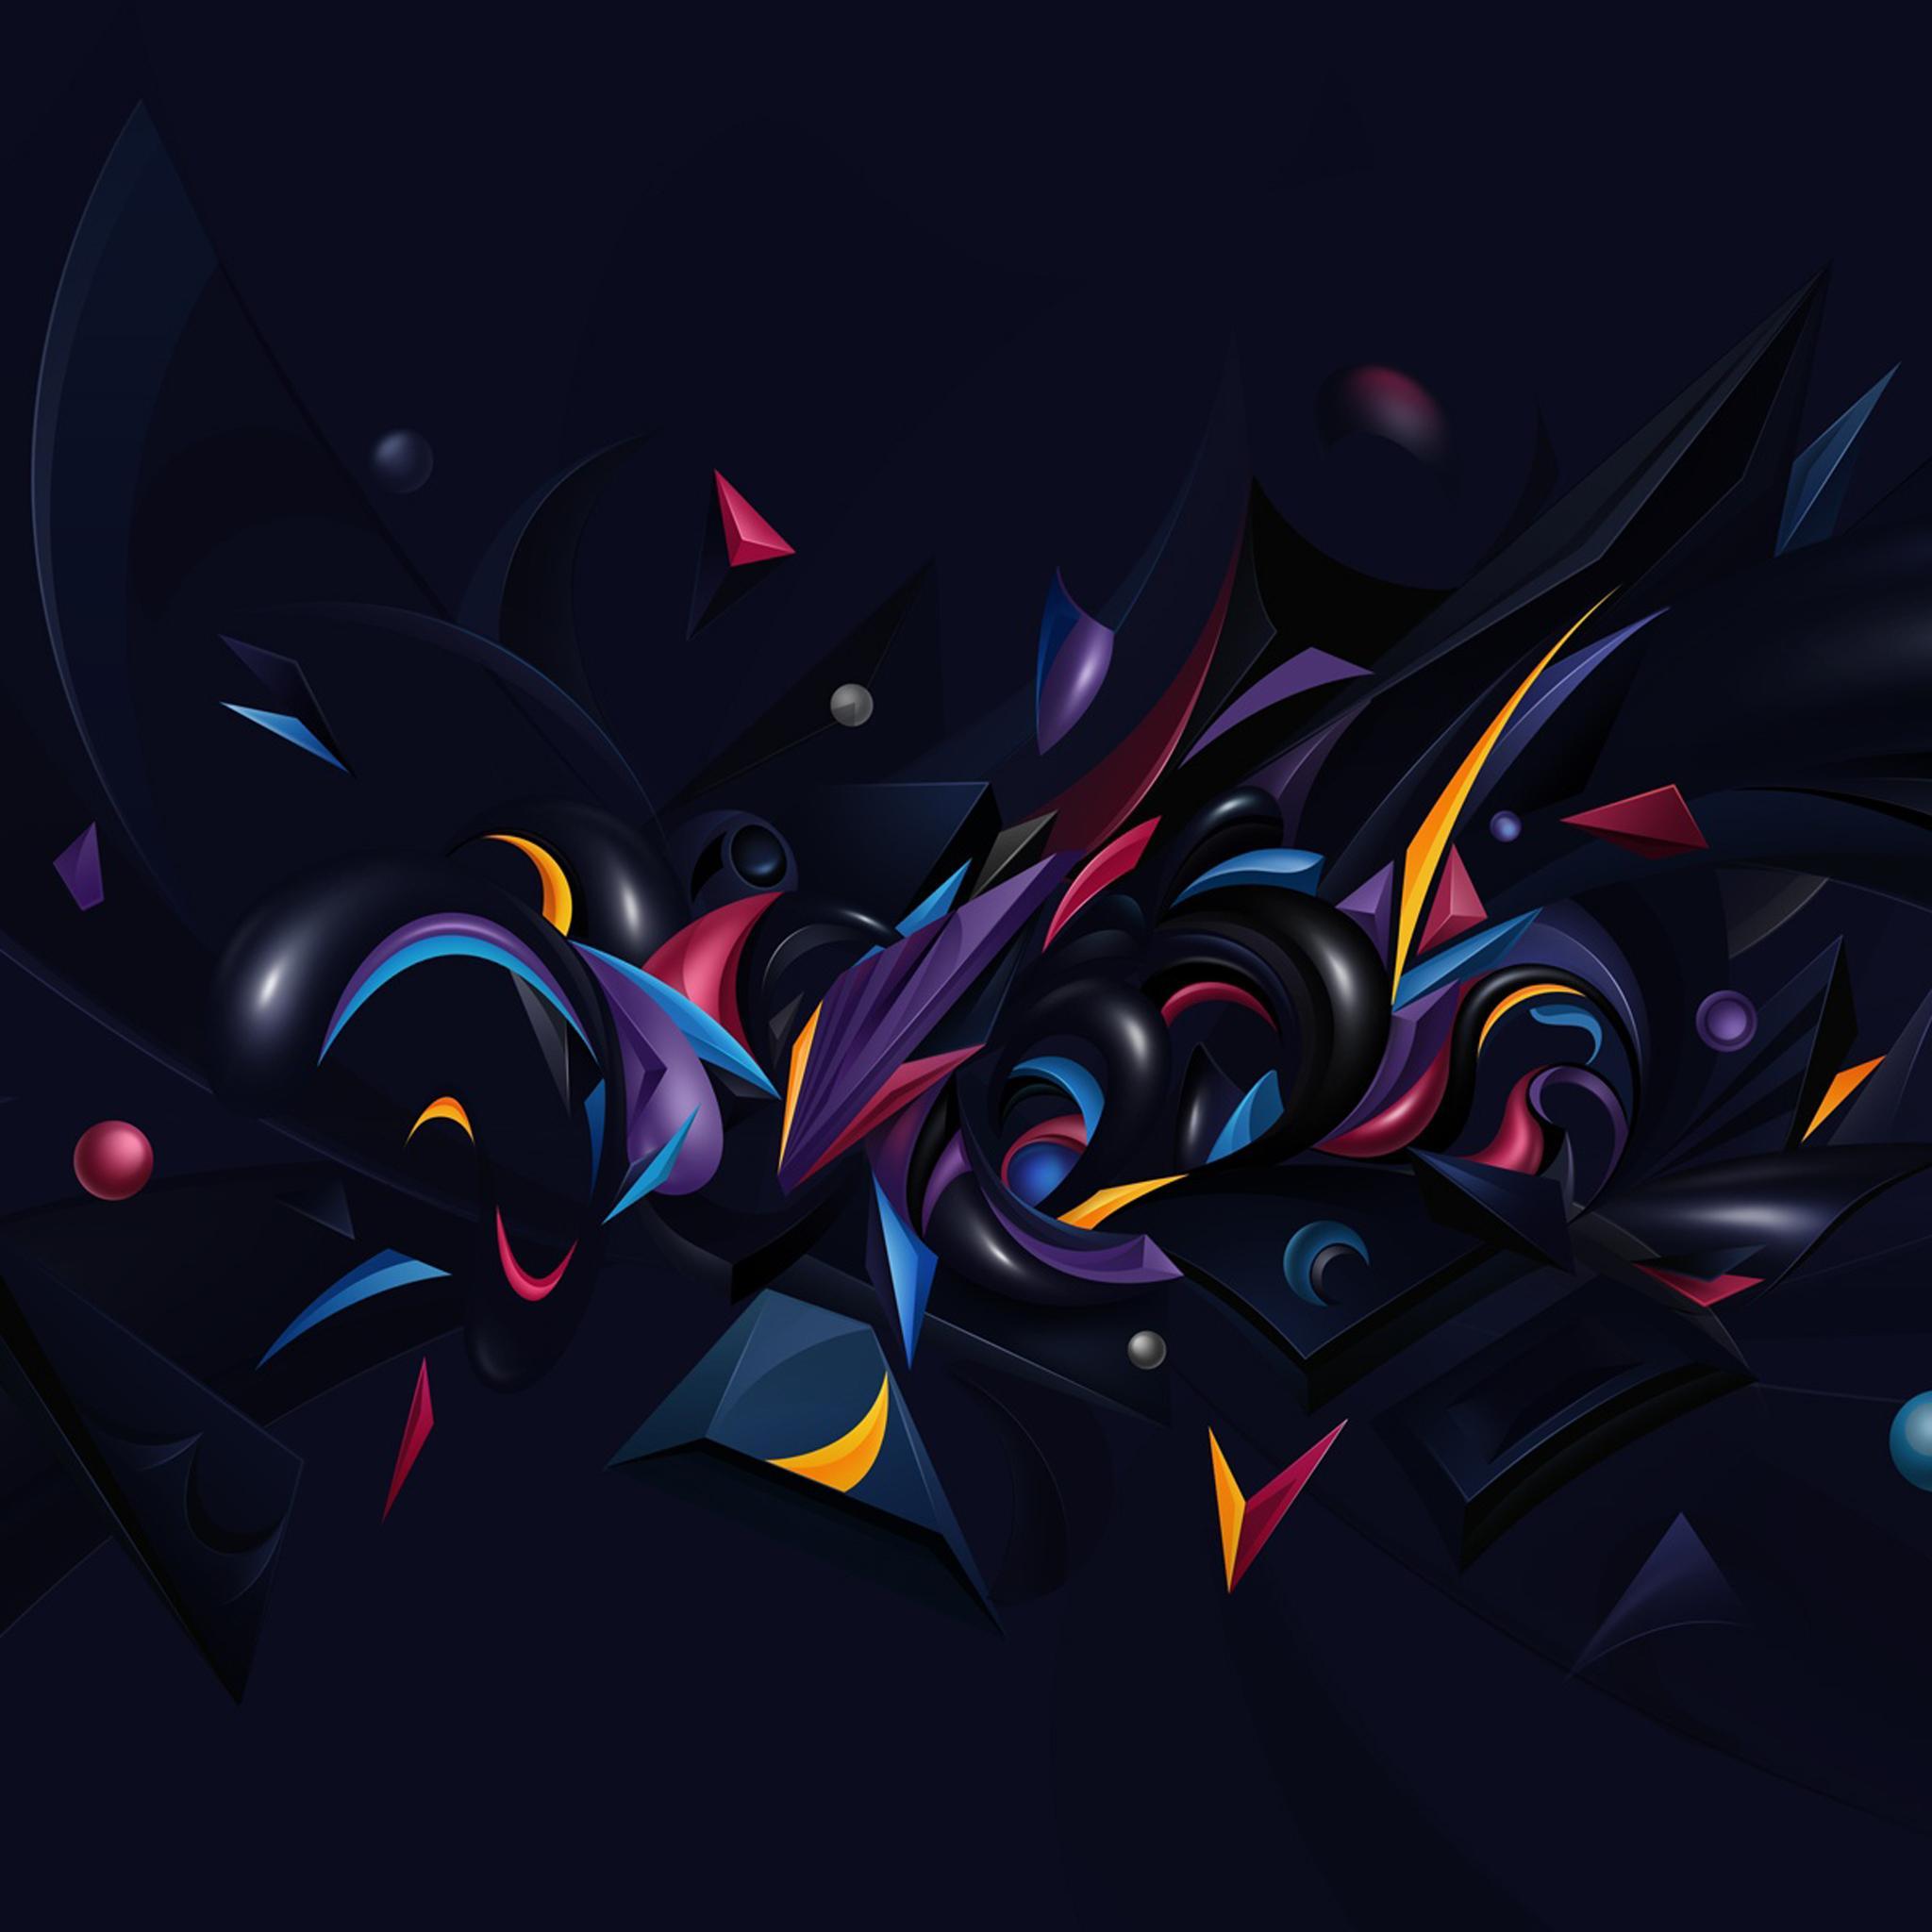 iPad Air Wallpapers HD 48 iPad Air Retina Wallpapers and Backgrounds 2048x2048